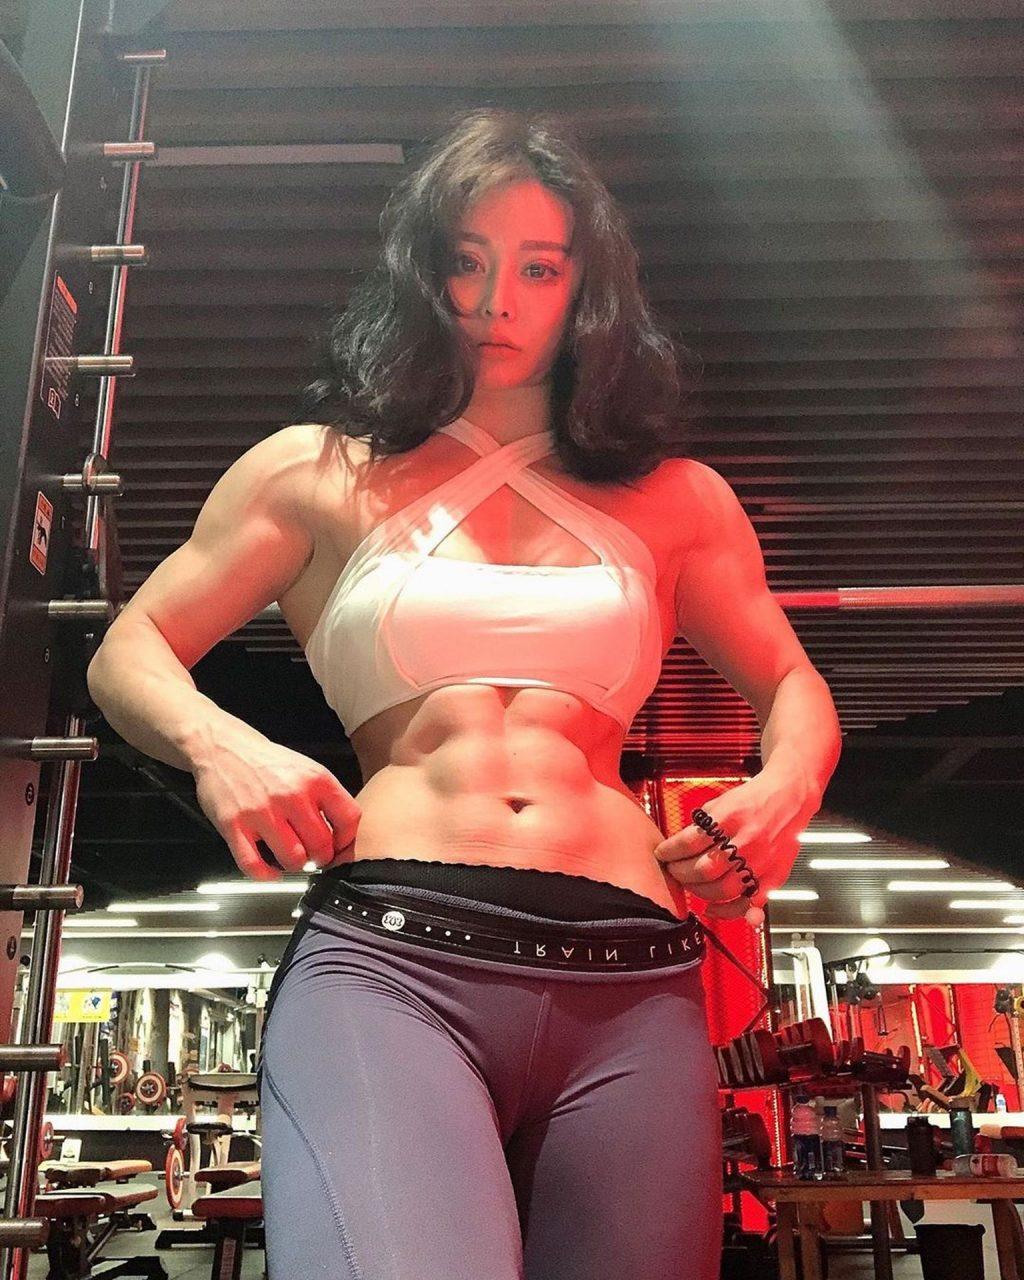 Asian Female Bodybuilder Porn yuan herong nude & sexy (78 photos)   #thefappening